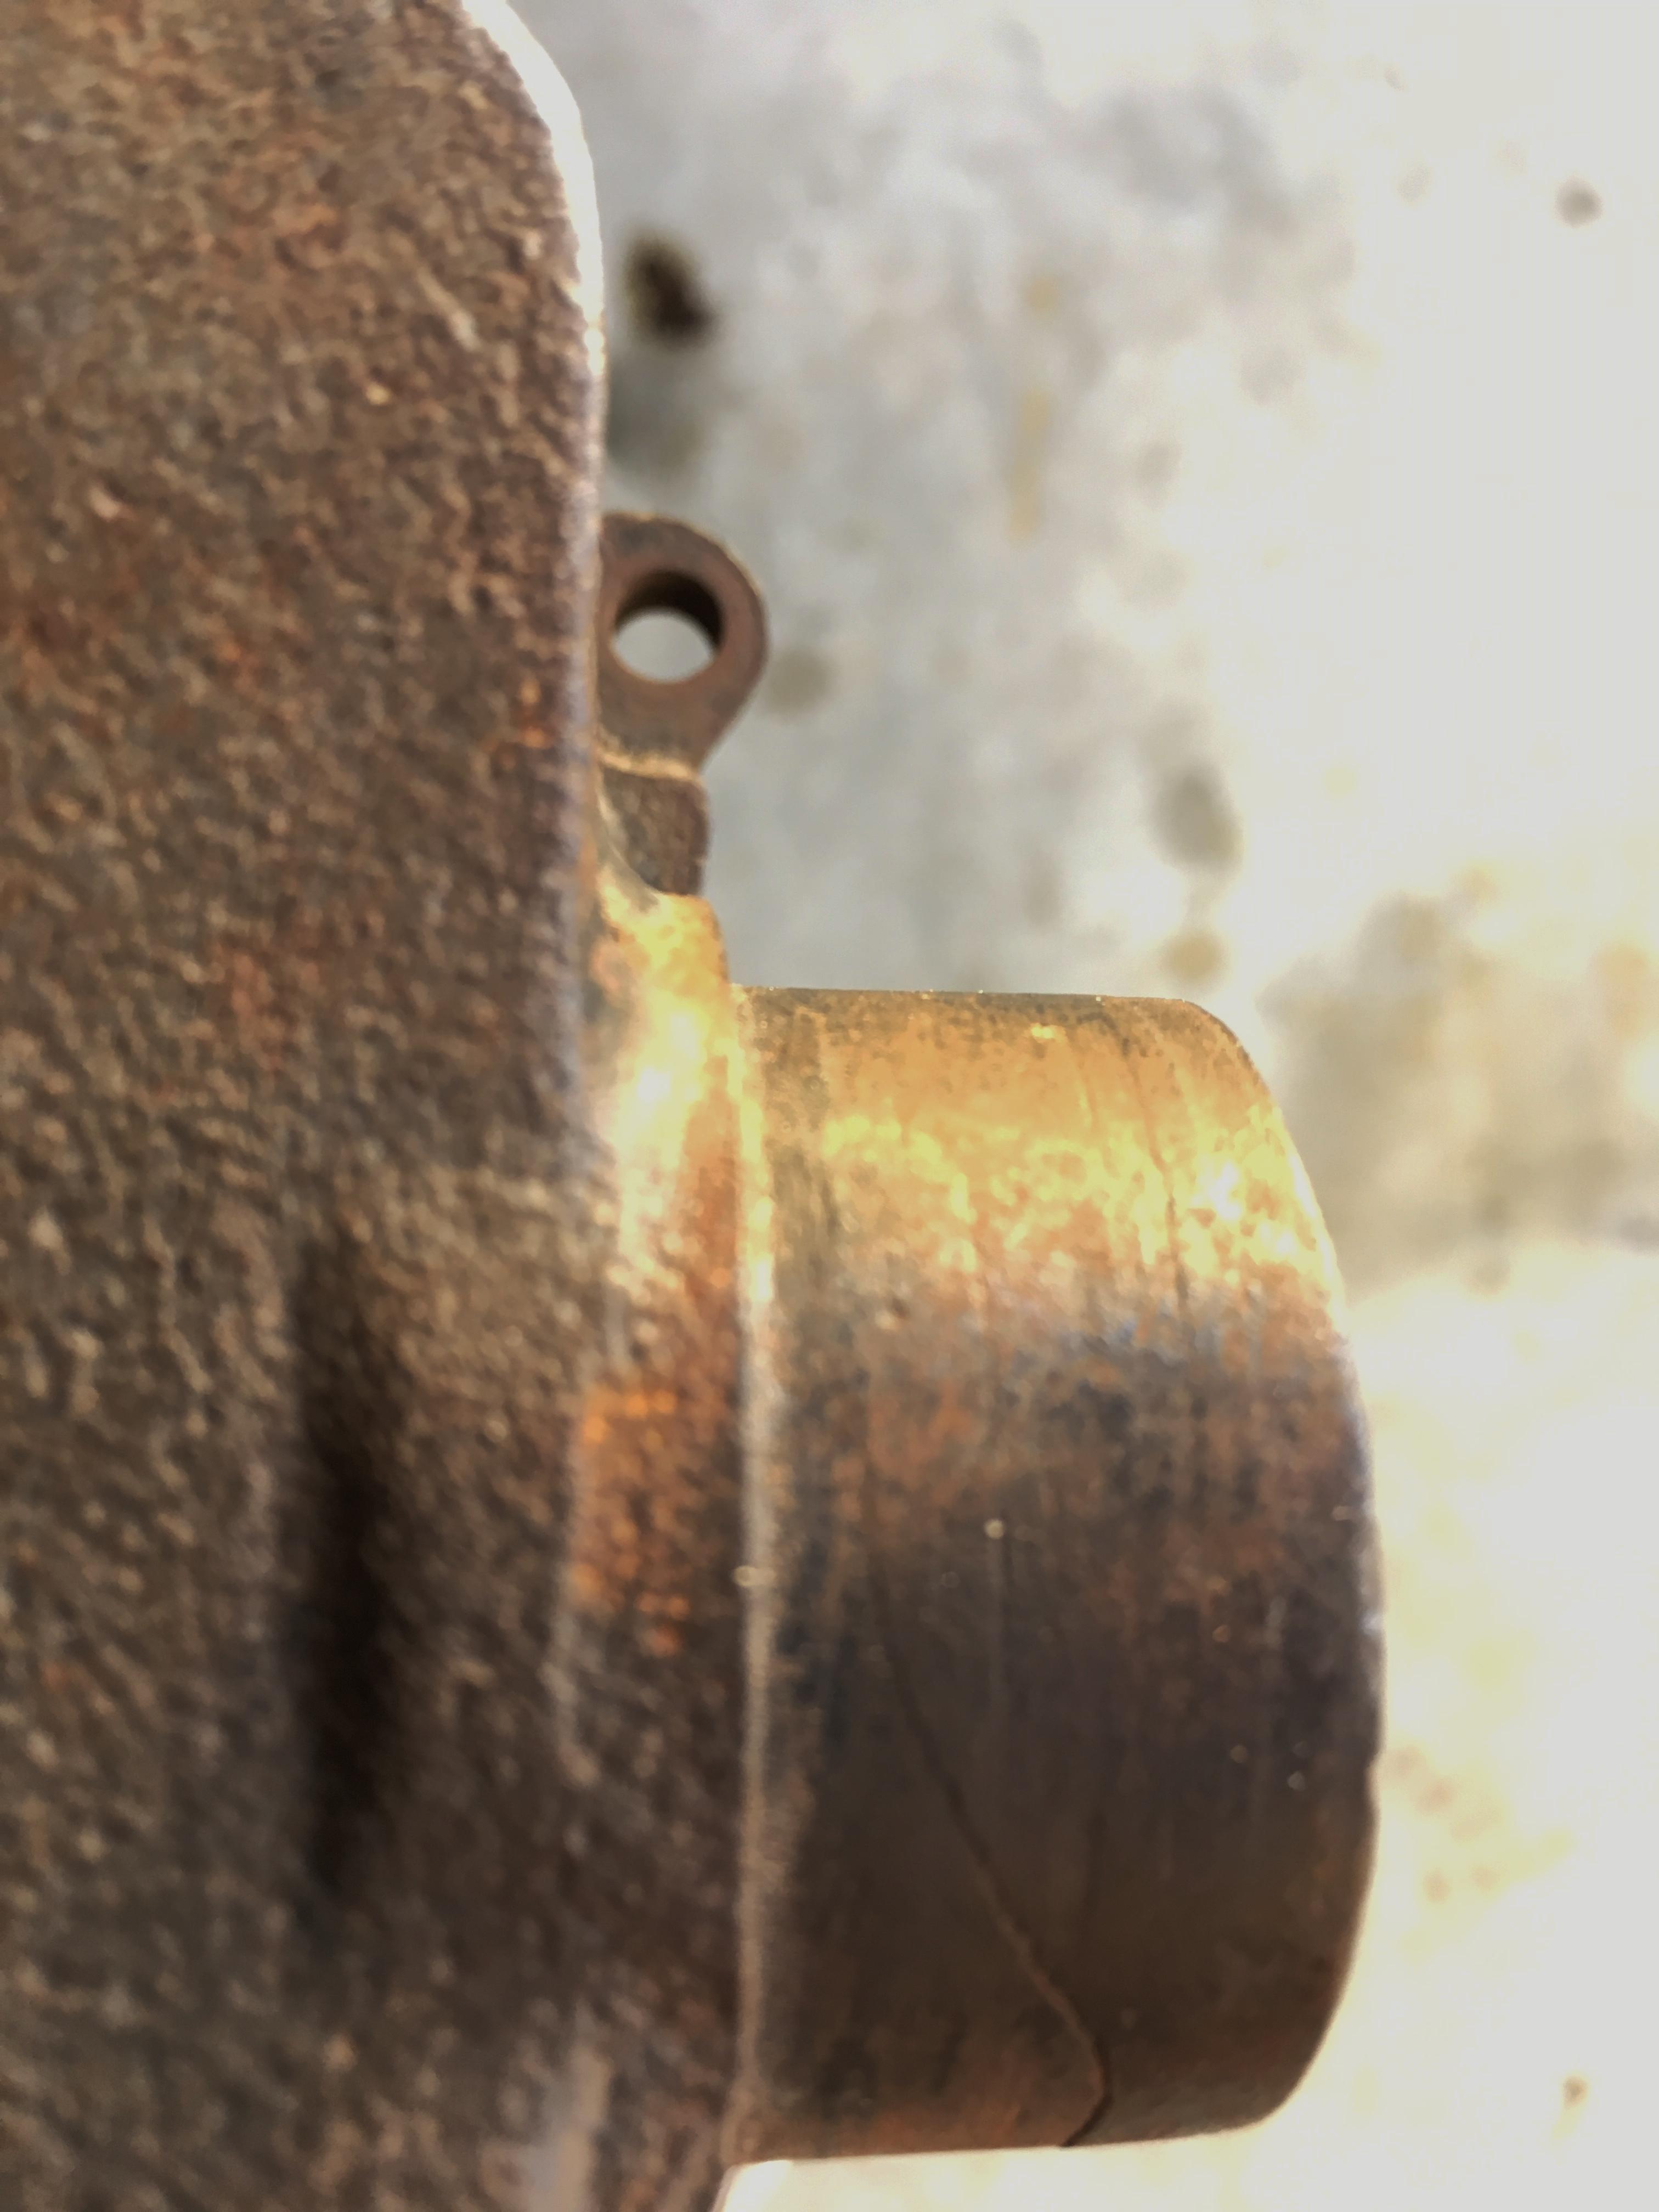 need advice on exhaust spigots-1.jpg